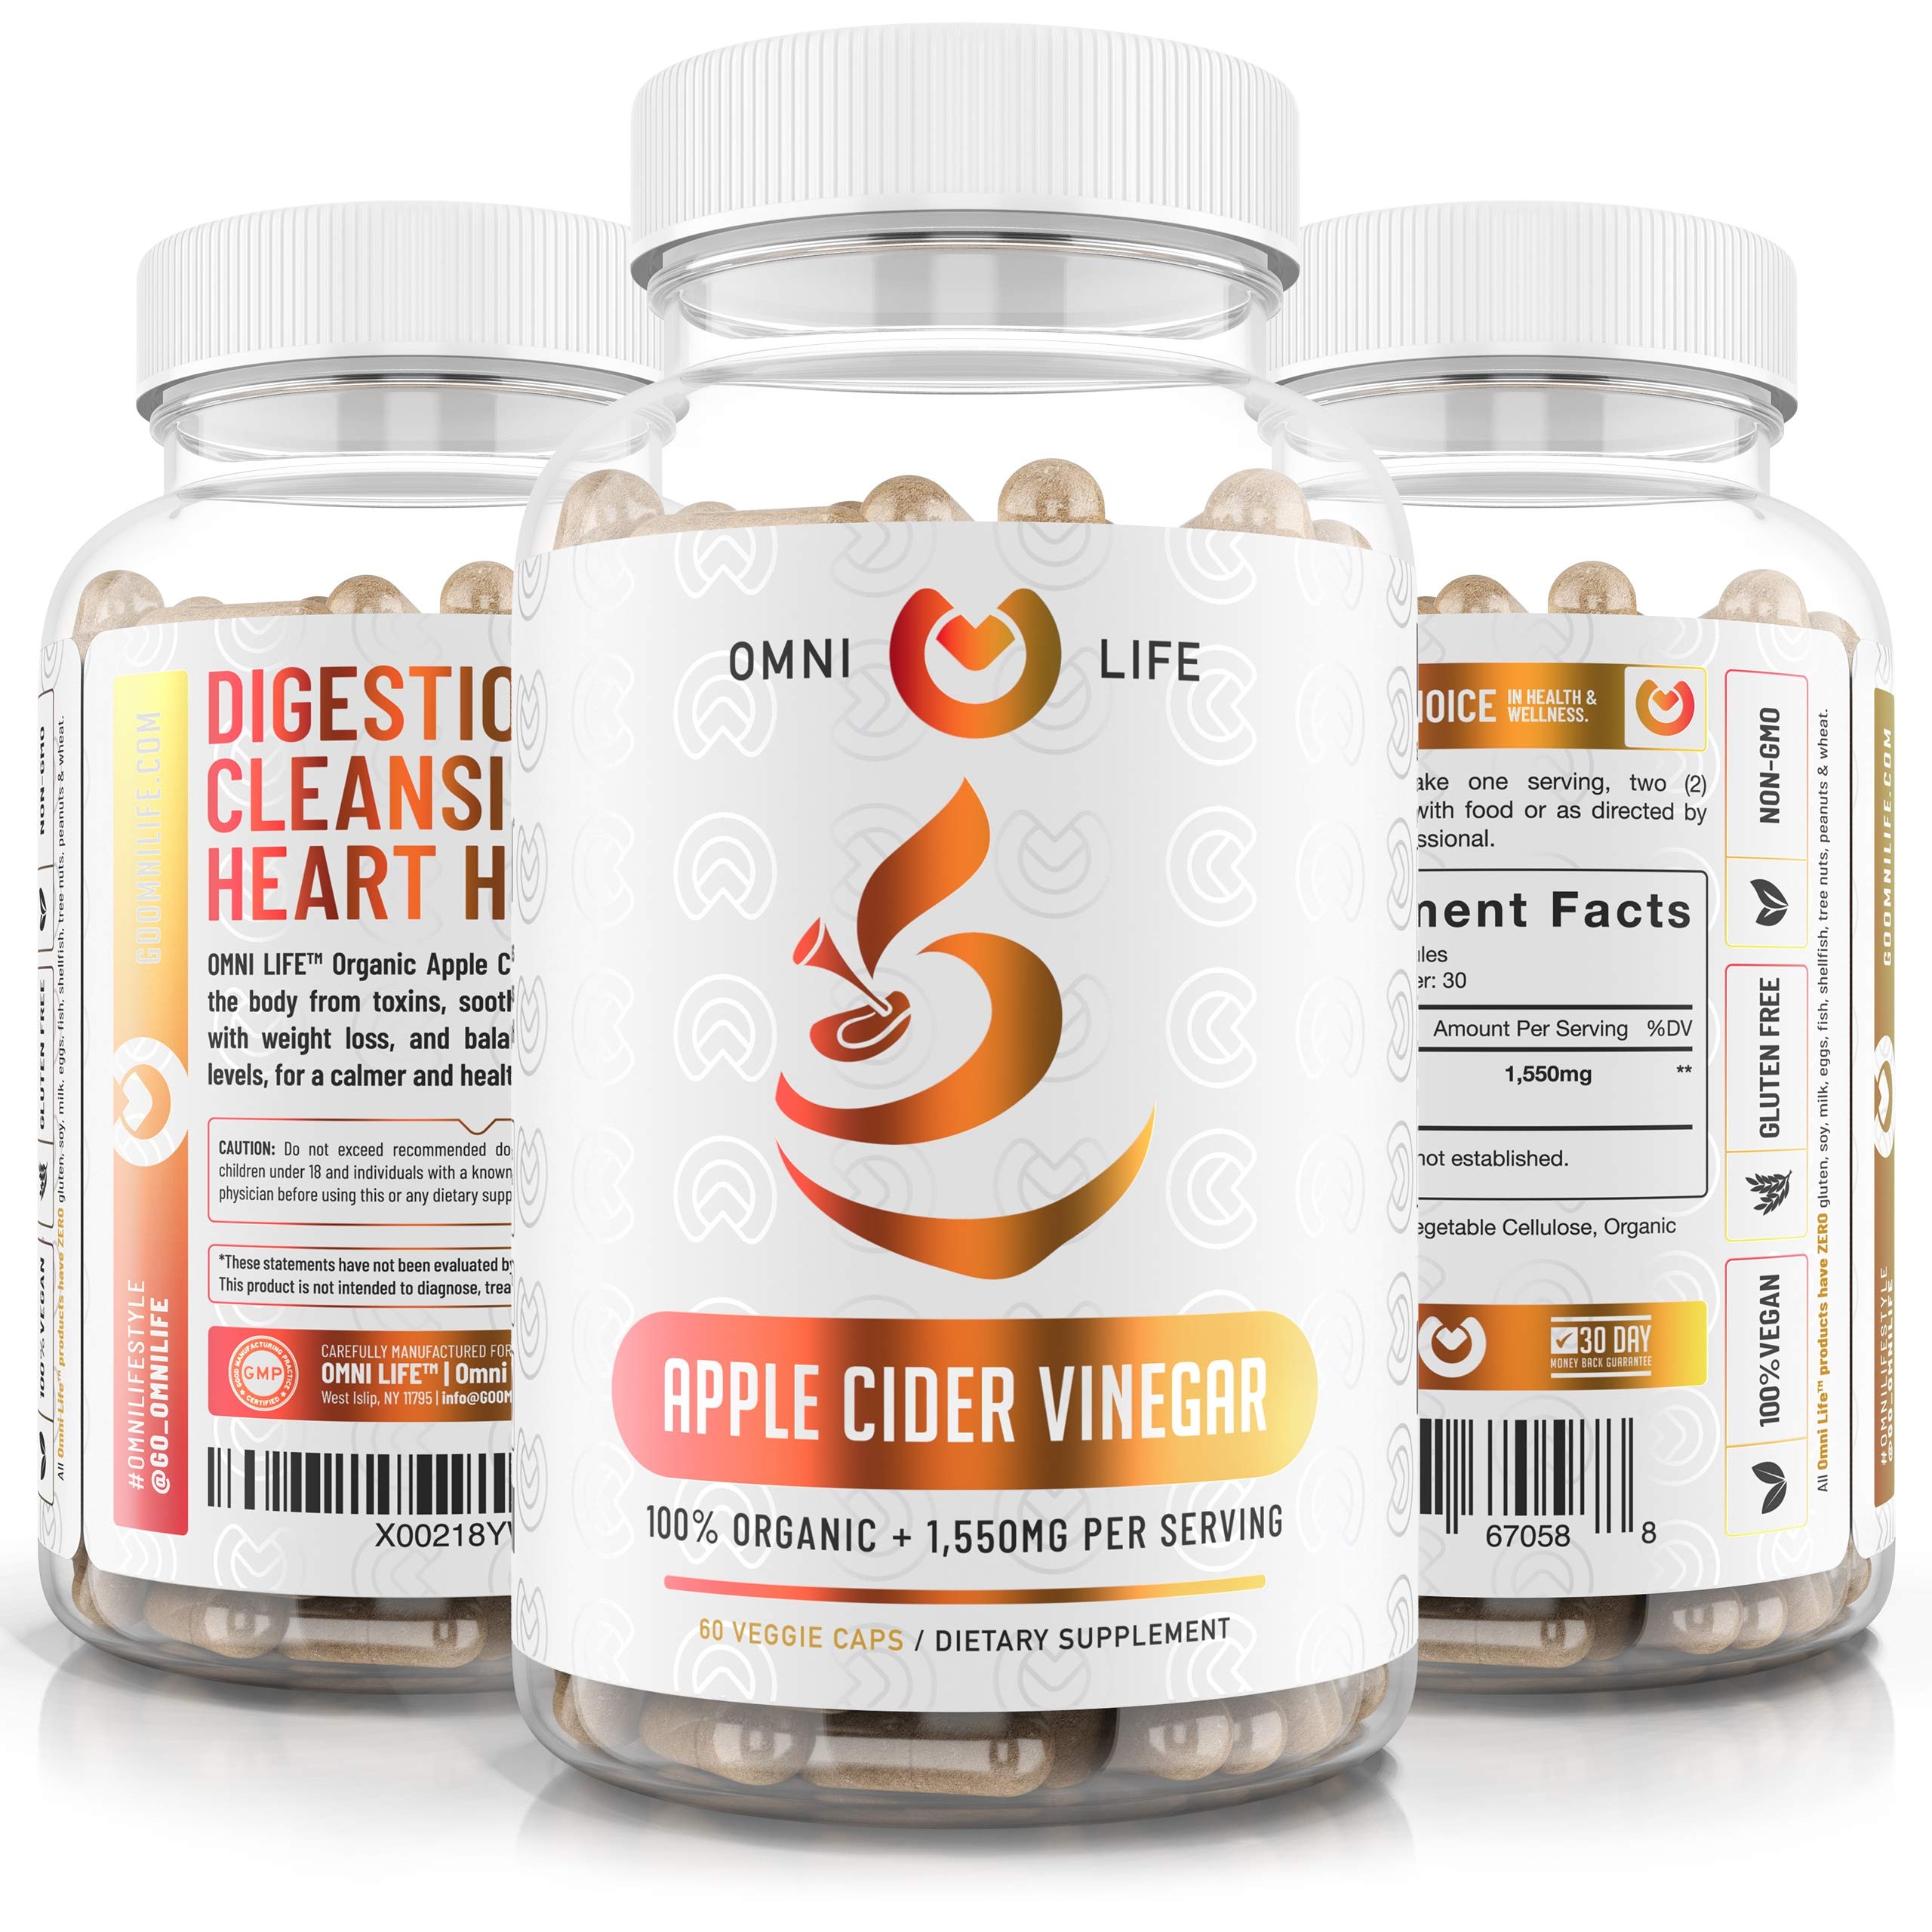 Apple Cider Vinegar Capsules - 100% Organic Max Strength 1550mg Natural Weight Loss, Detox, Digestion - Powerful Cleanser, Premium Certified Organic & Non-GMO ACV Supplement - 60 Vegan Capsules.